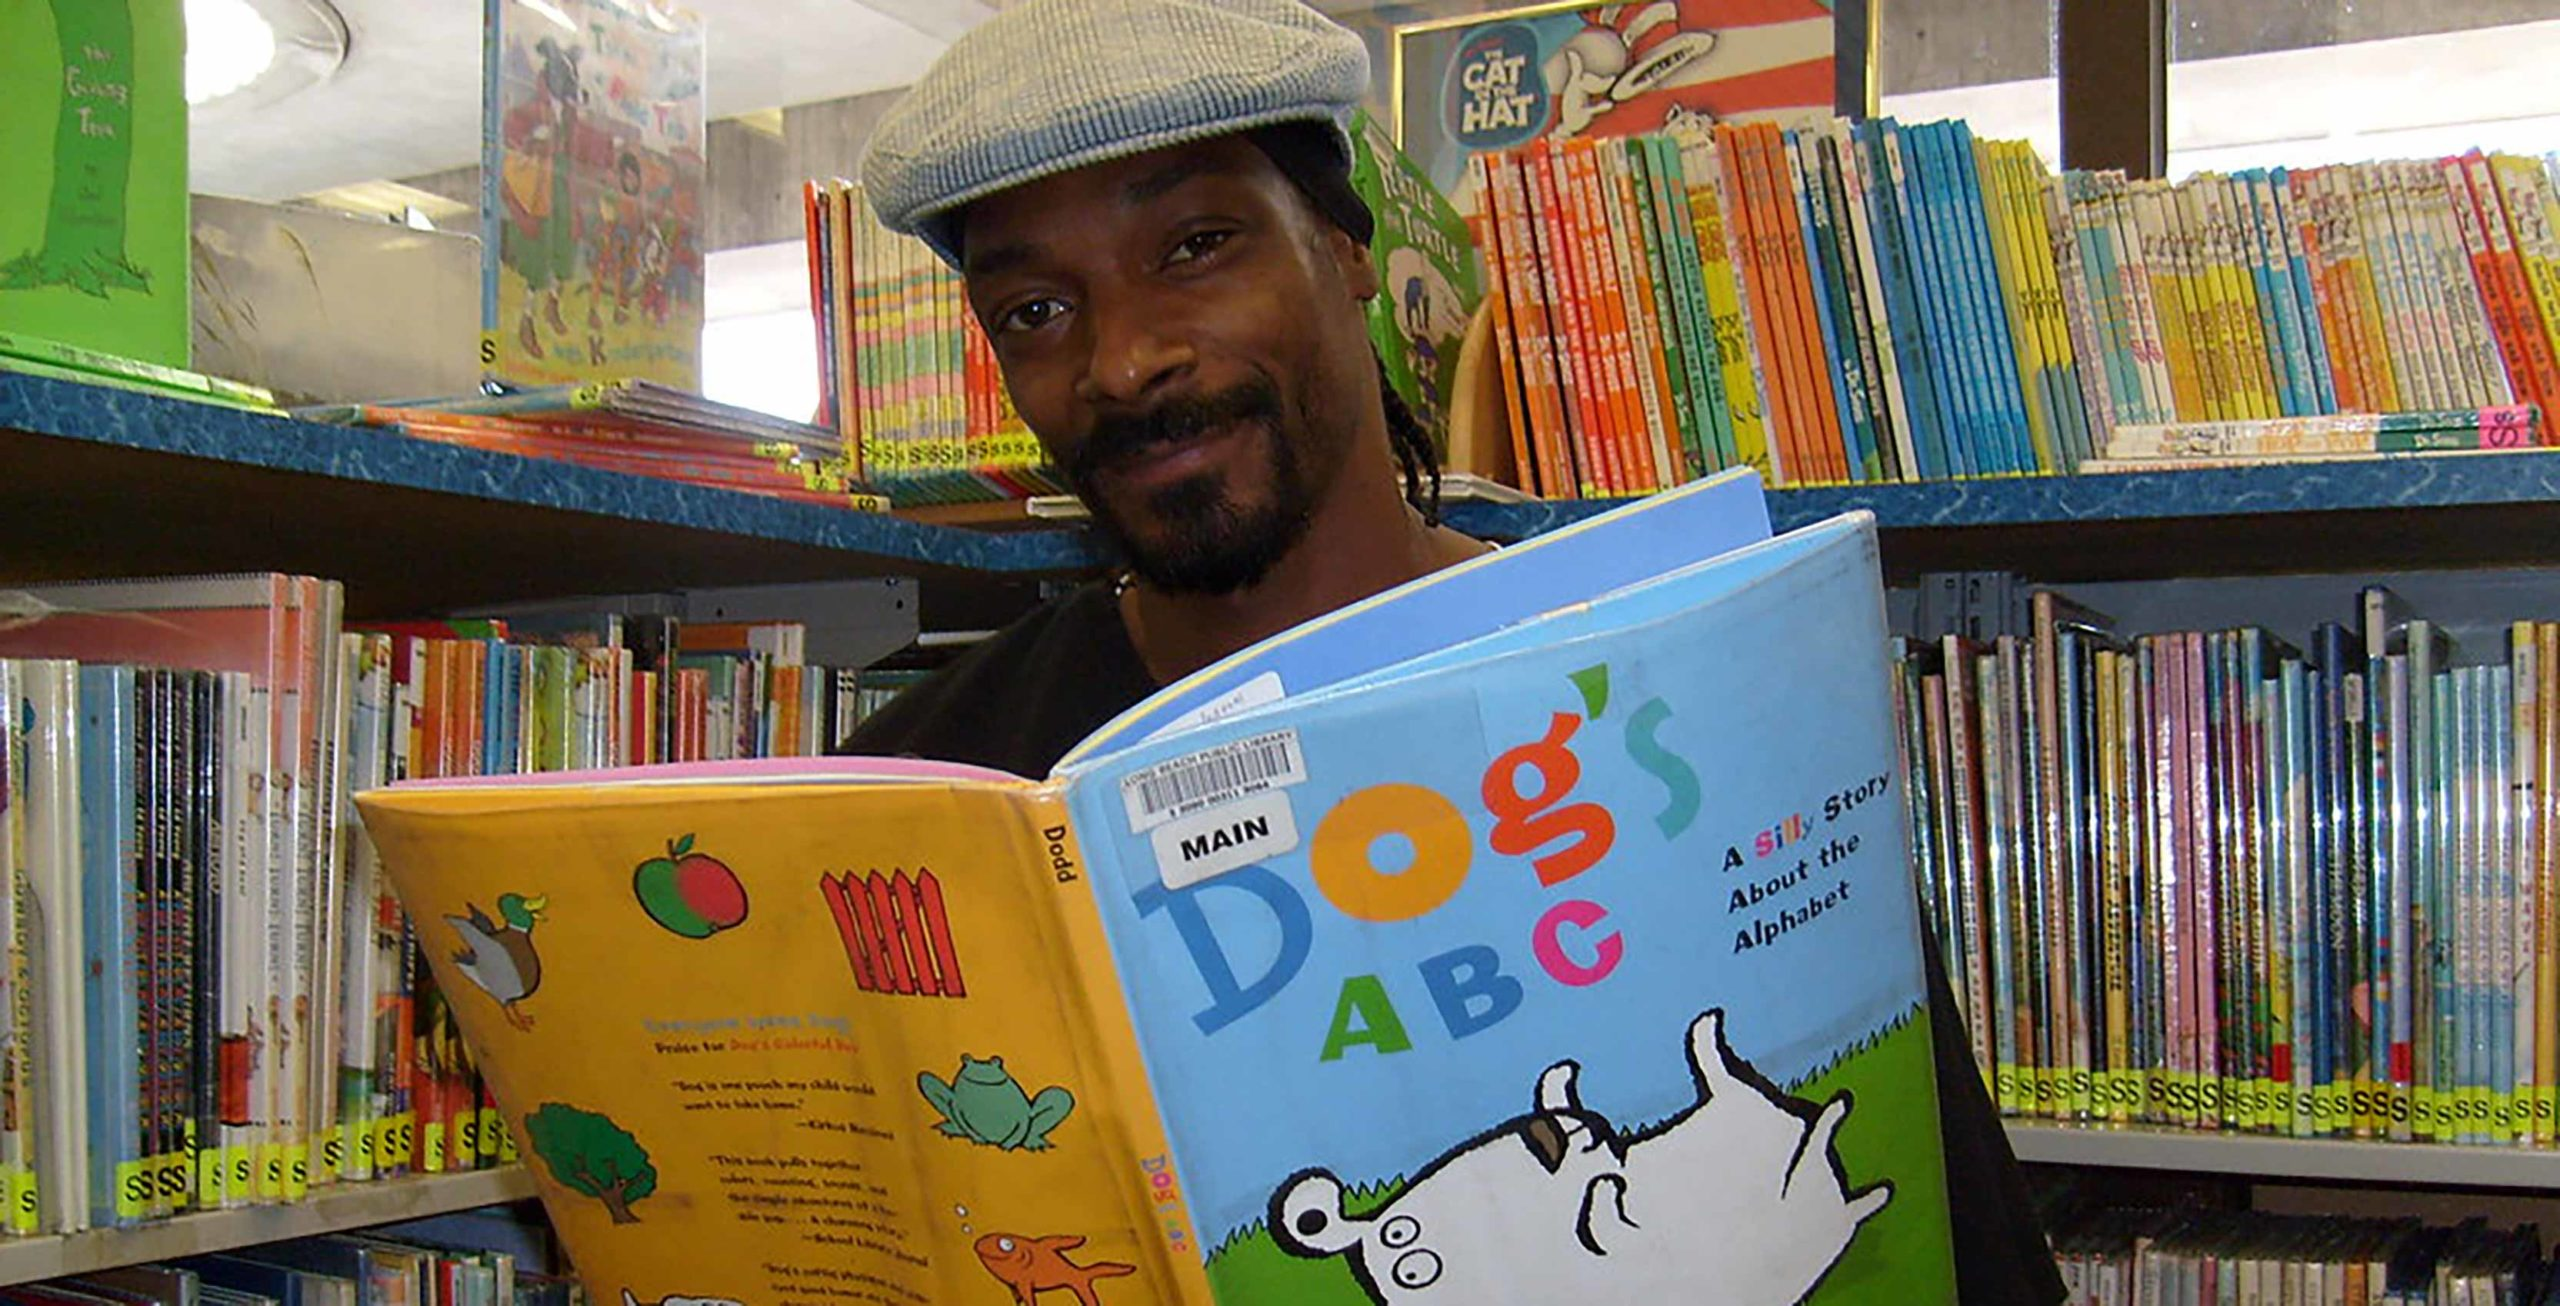 Snoop Dogg reads